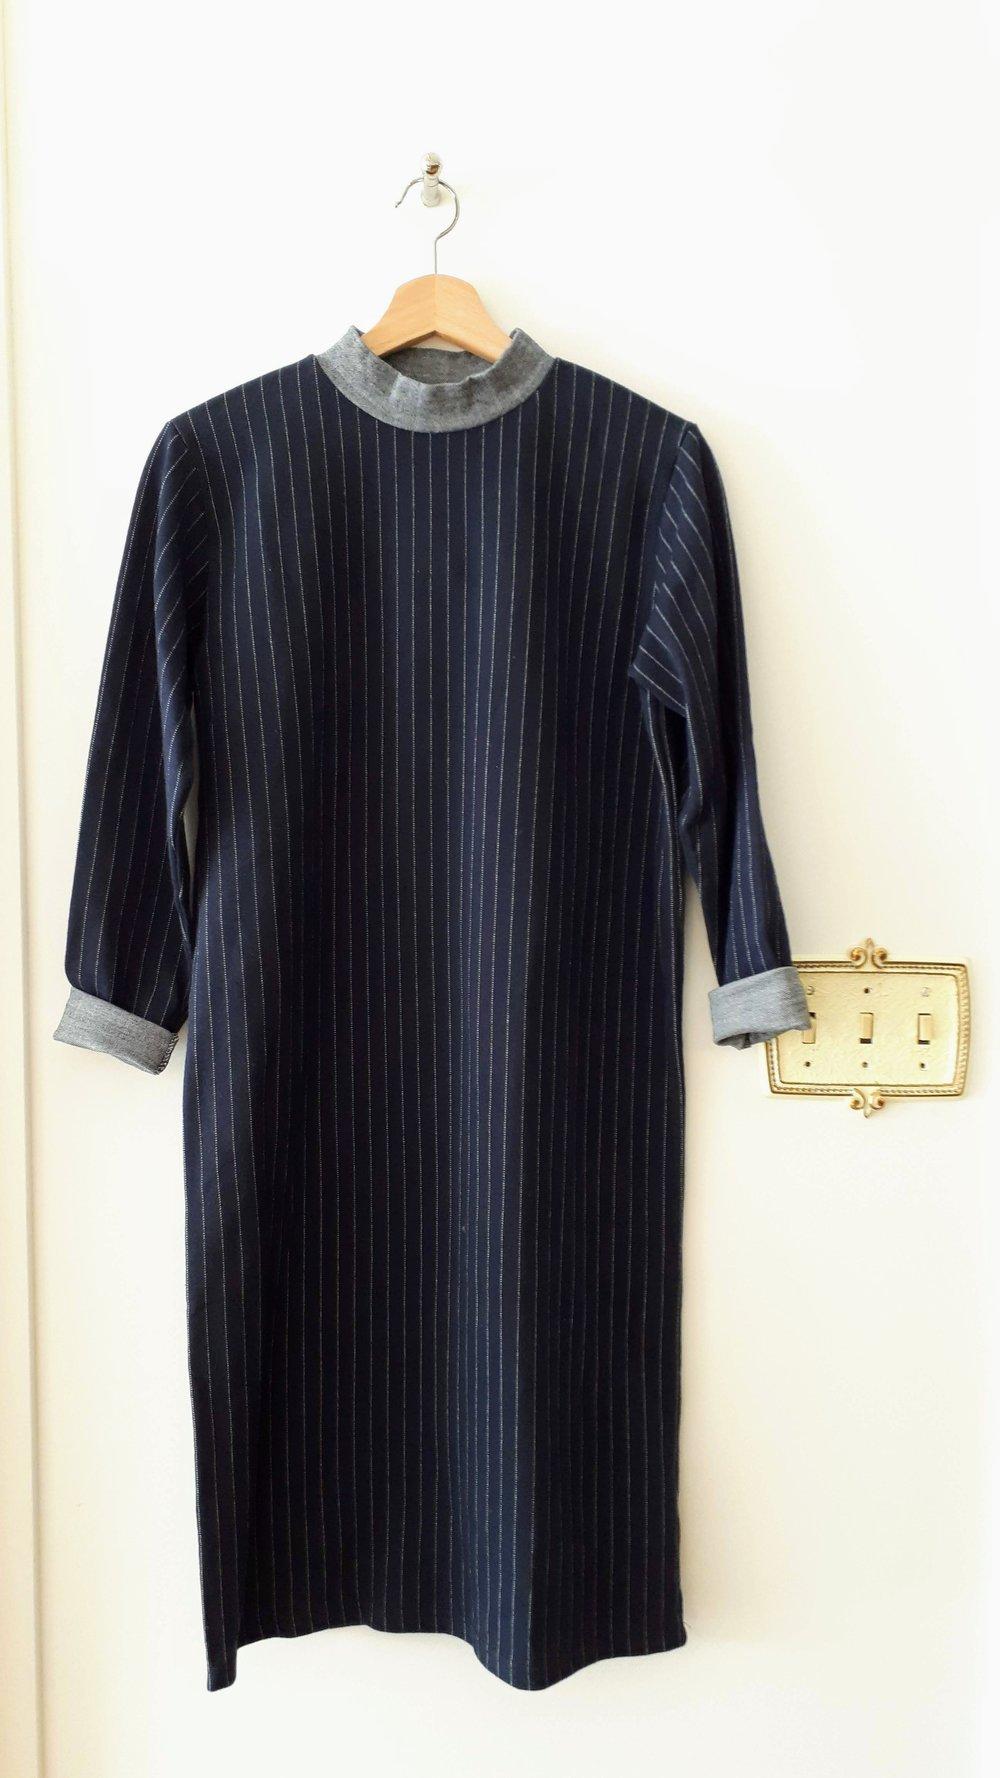 Noul dress (NWT); Size M, $38